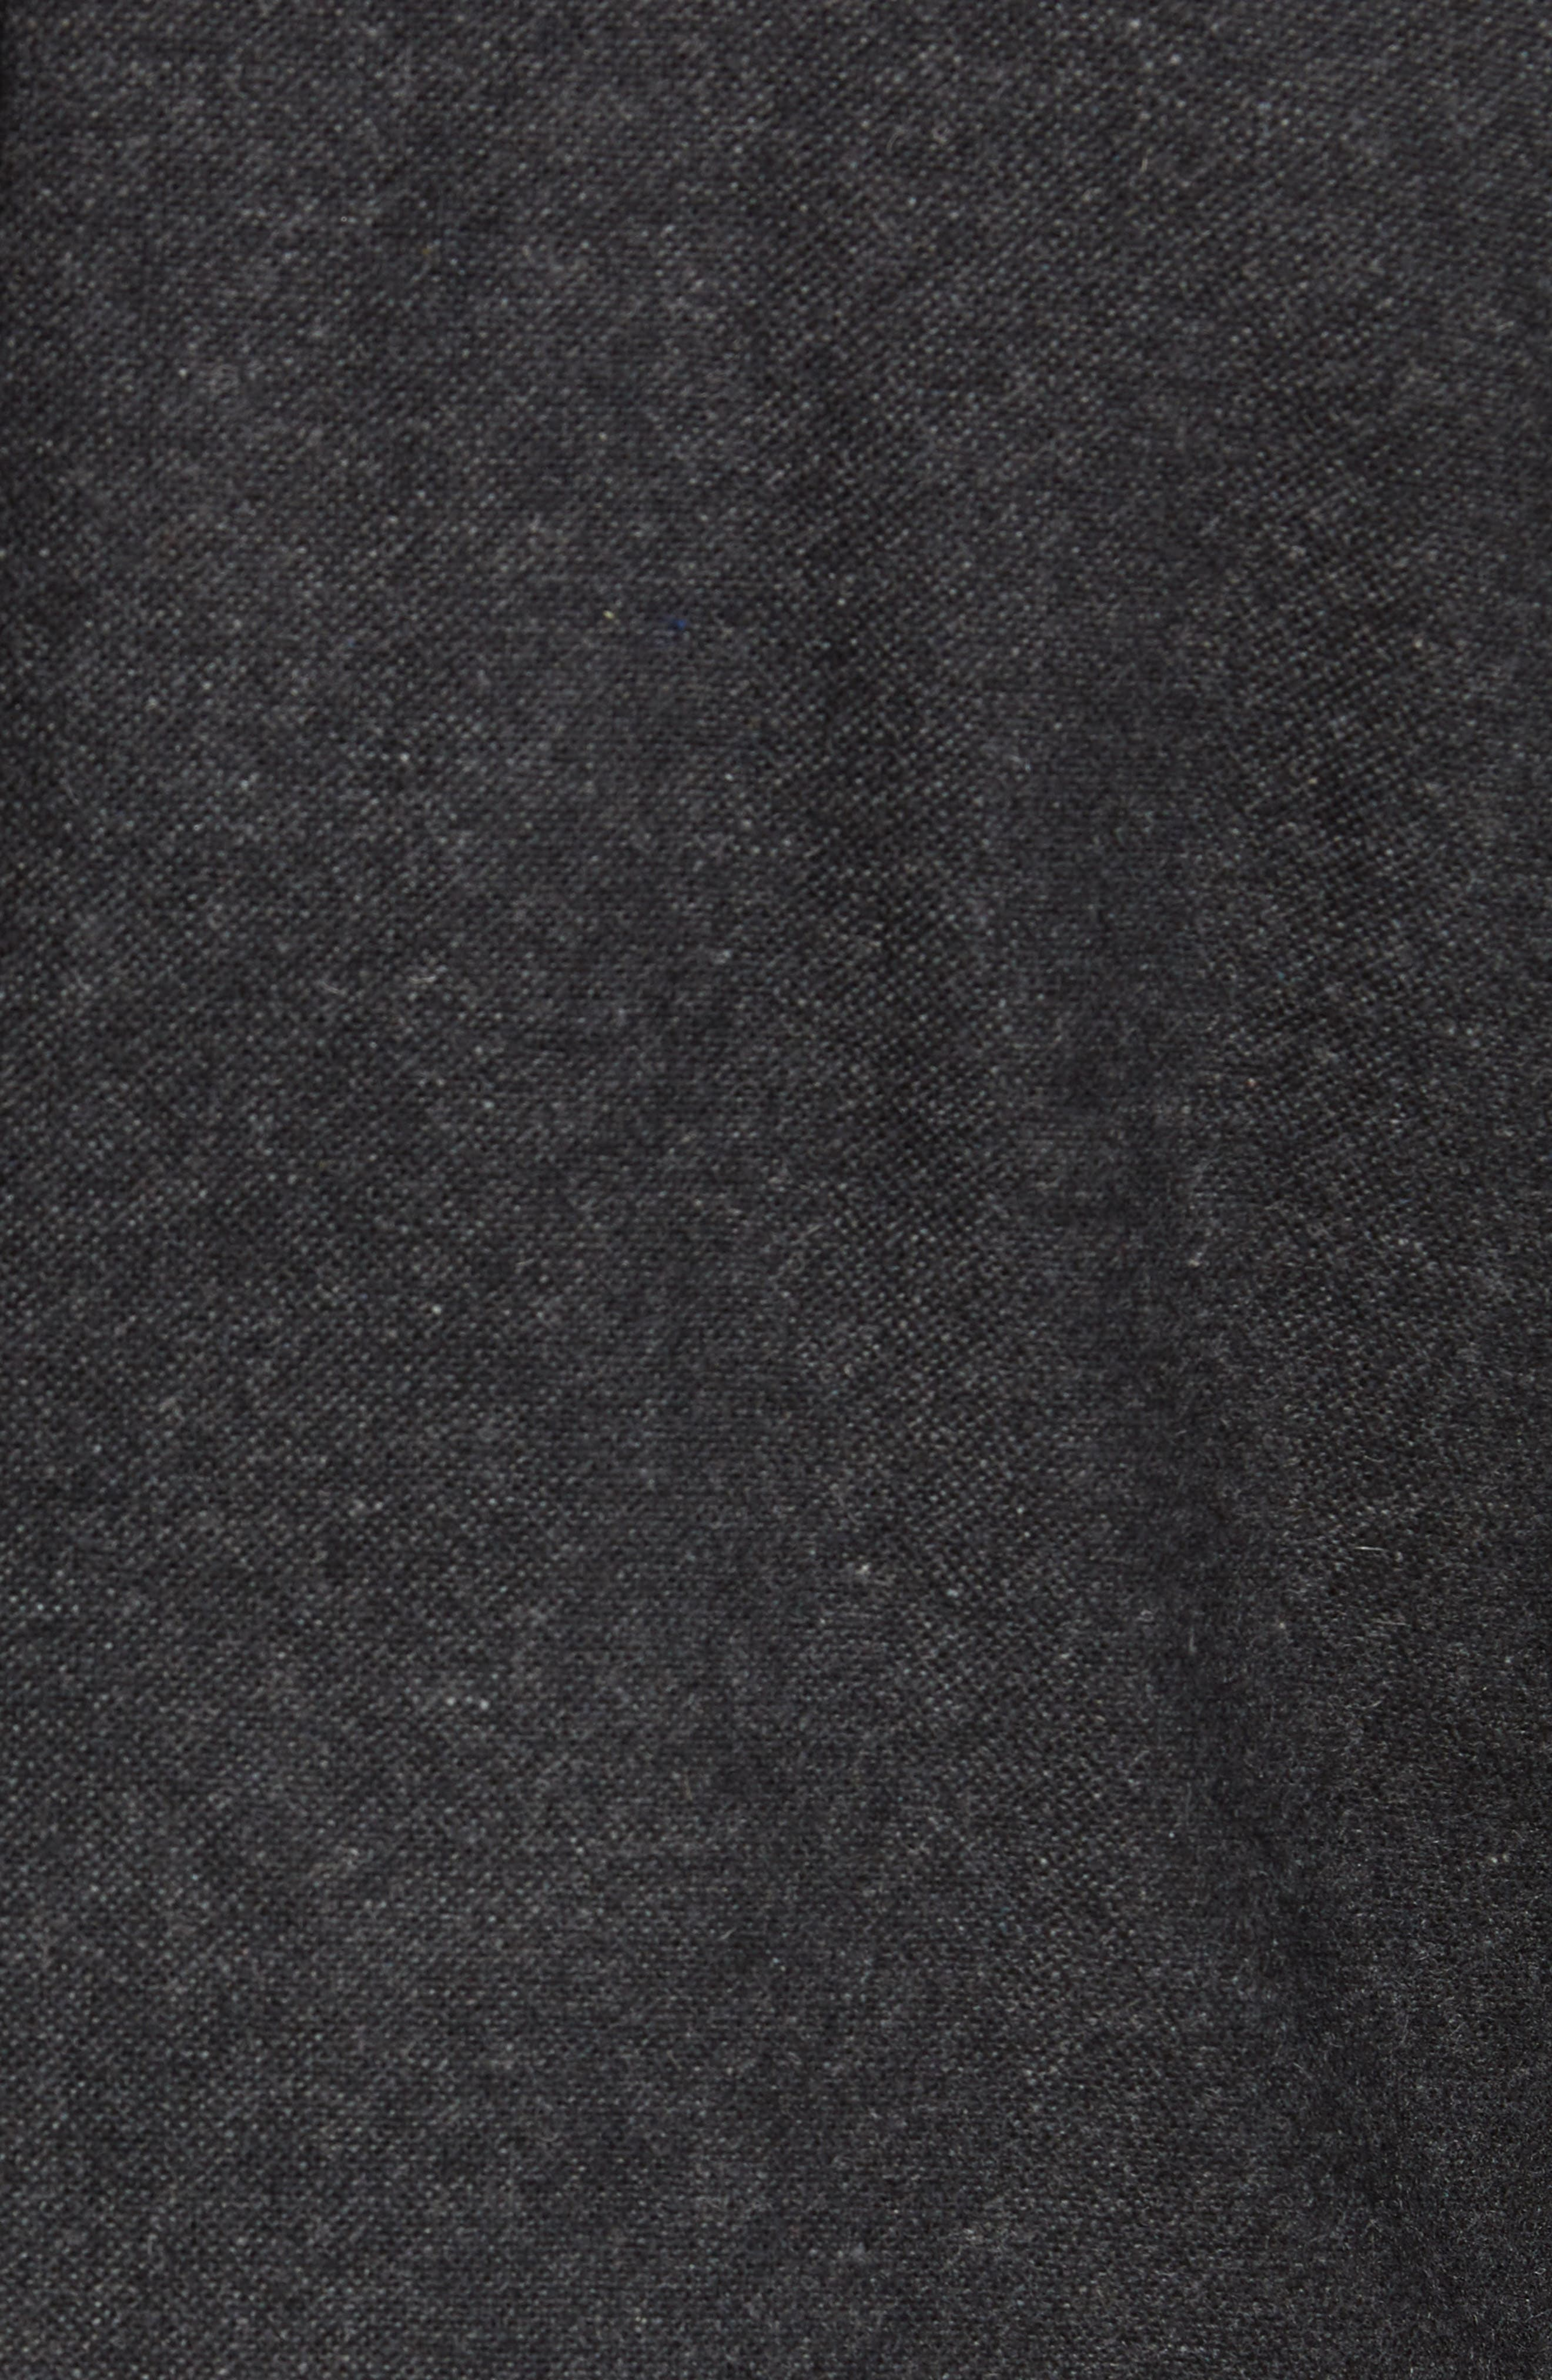 Slim Fit Myloiver Wool Blend Blazer,                             Alternate thumbnail 6, color,                             DARK GREY